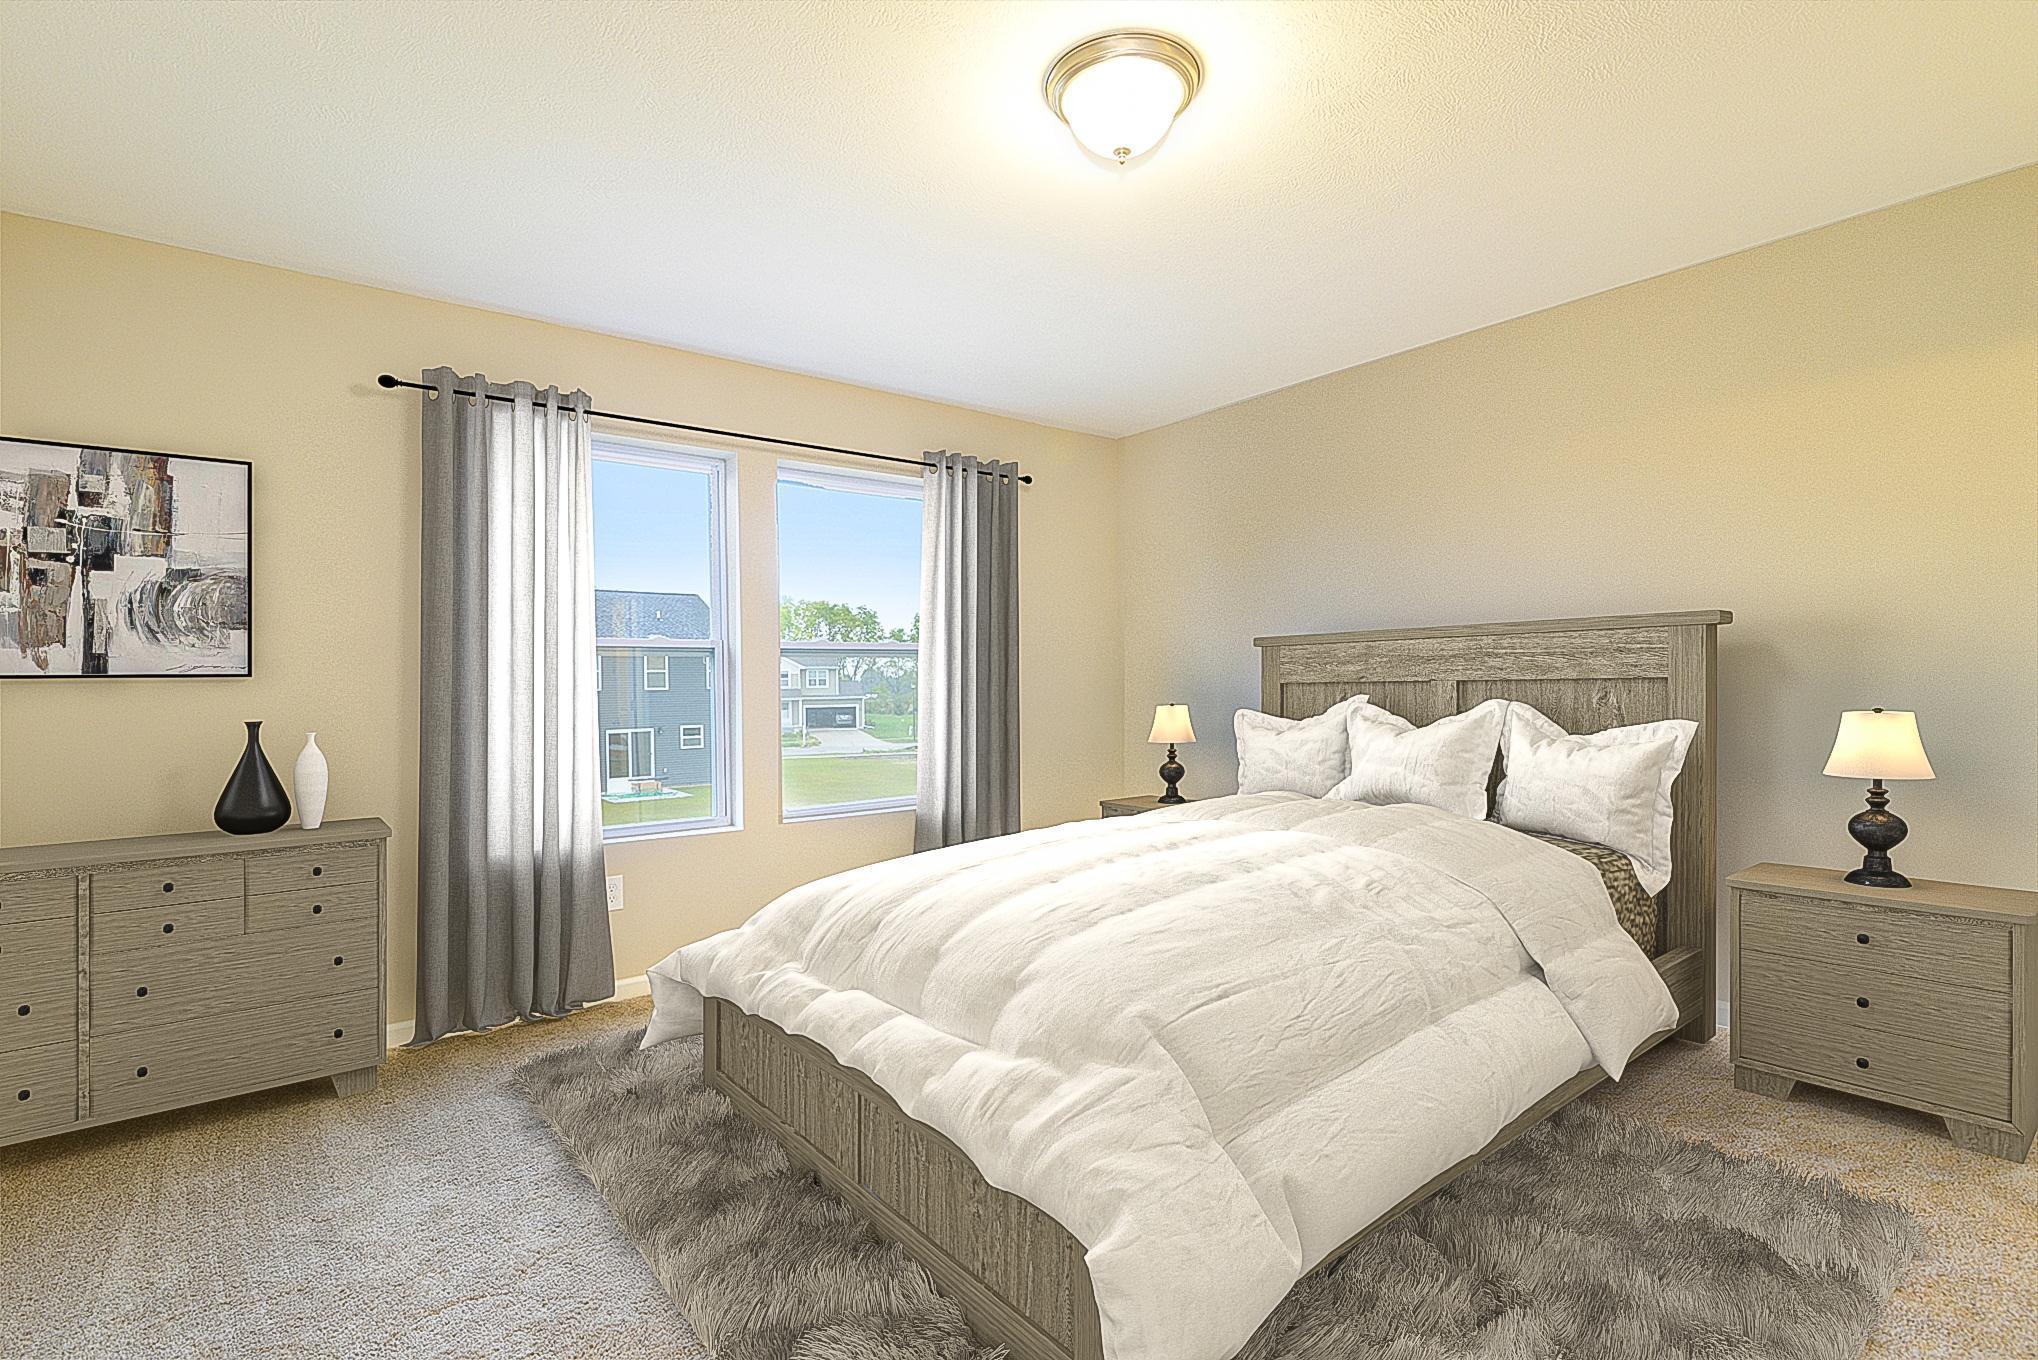 Bedroom featured in the Elements 1700 By Allen Edwin Homes in Ann Arbor, MI